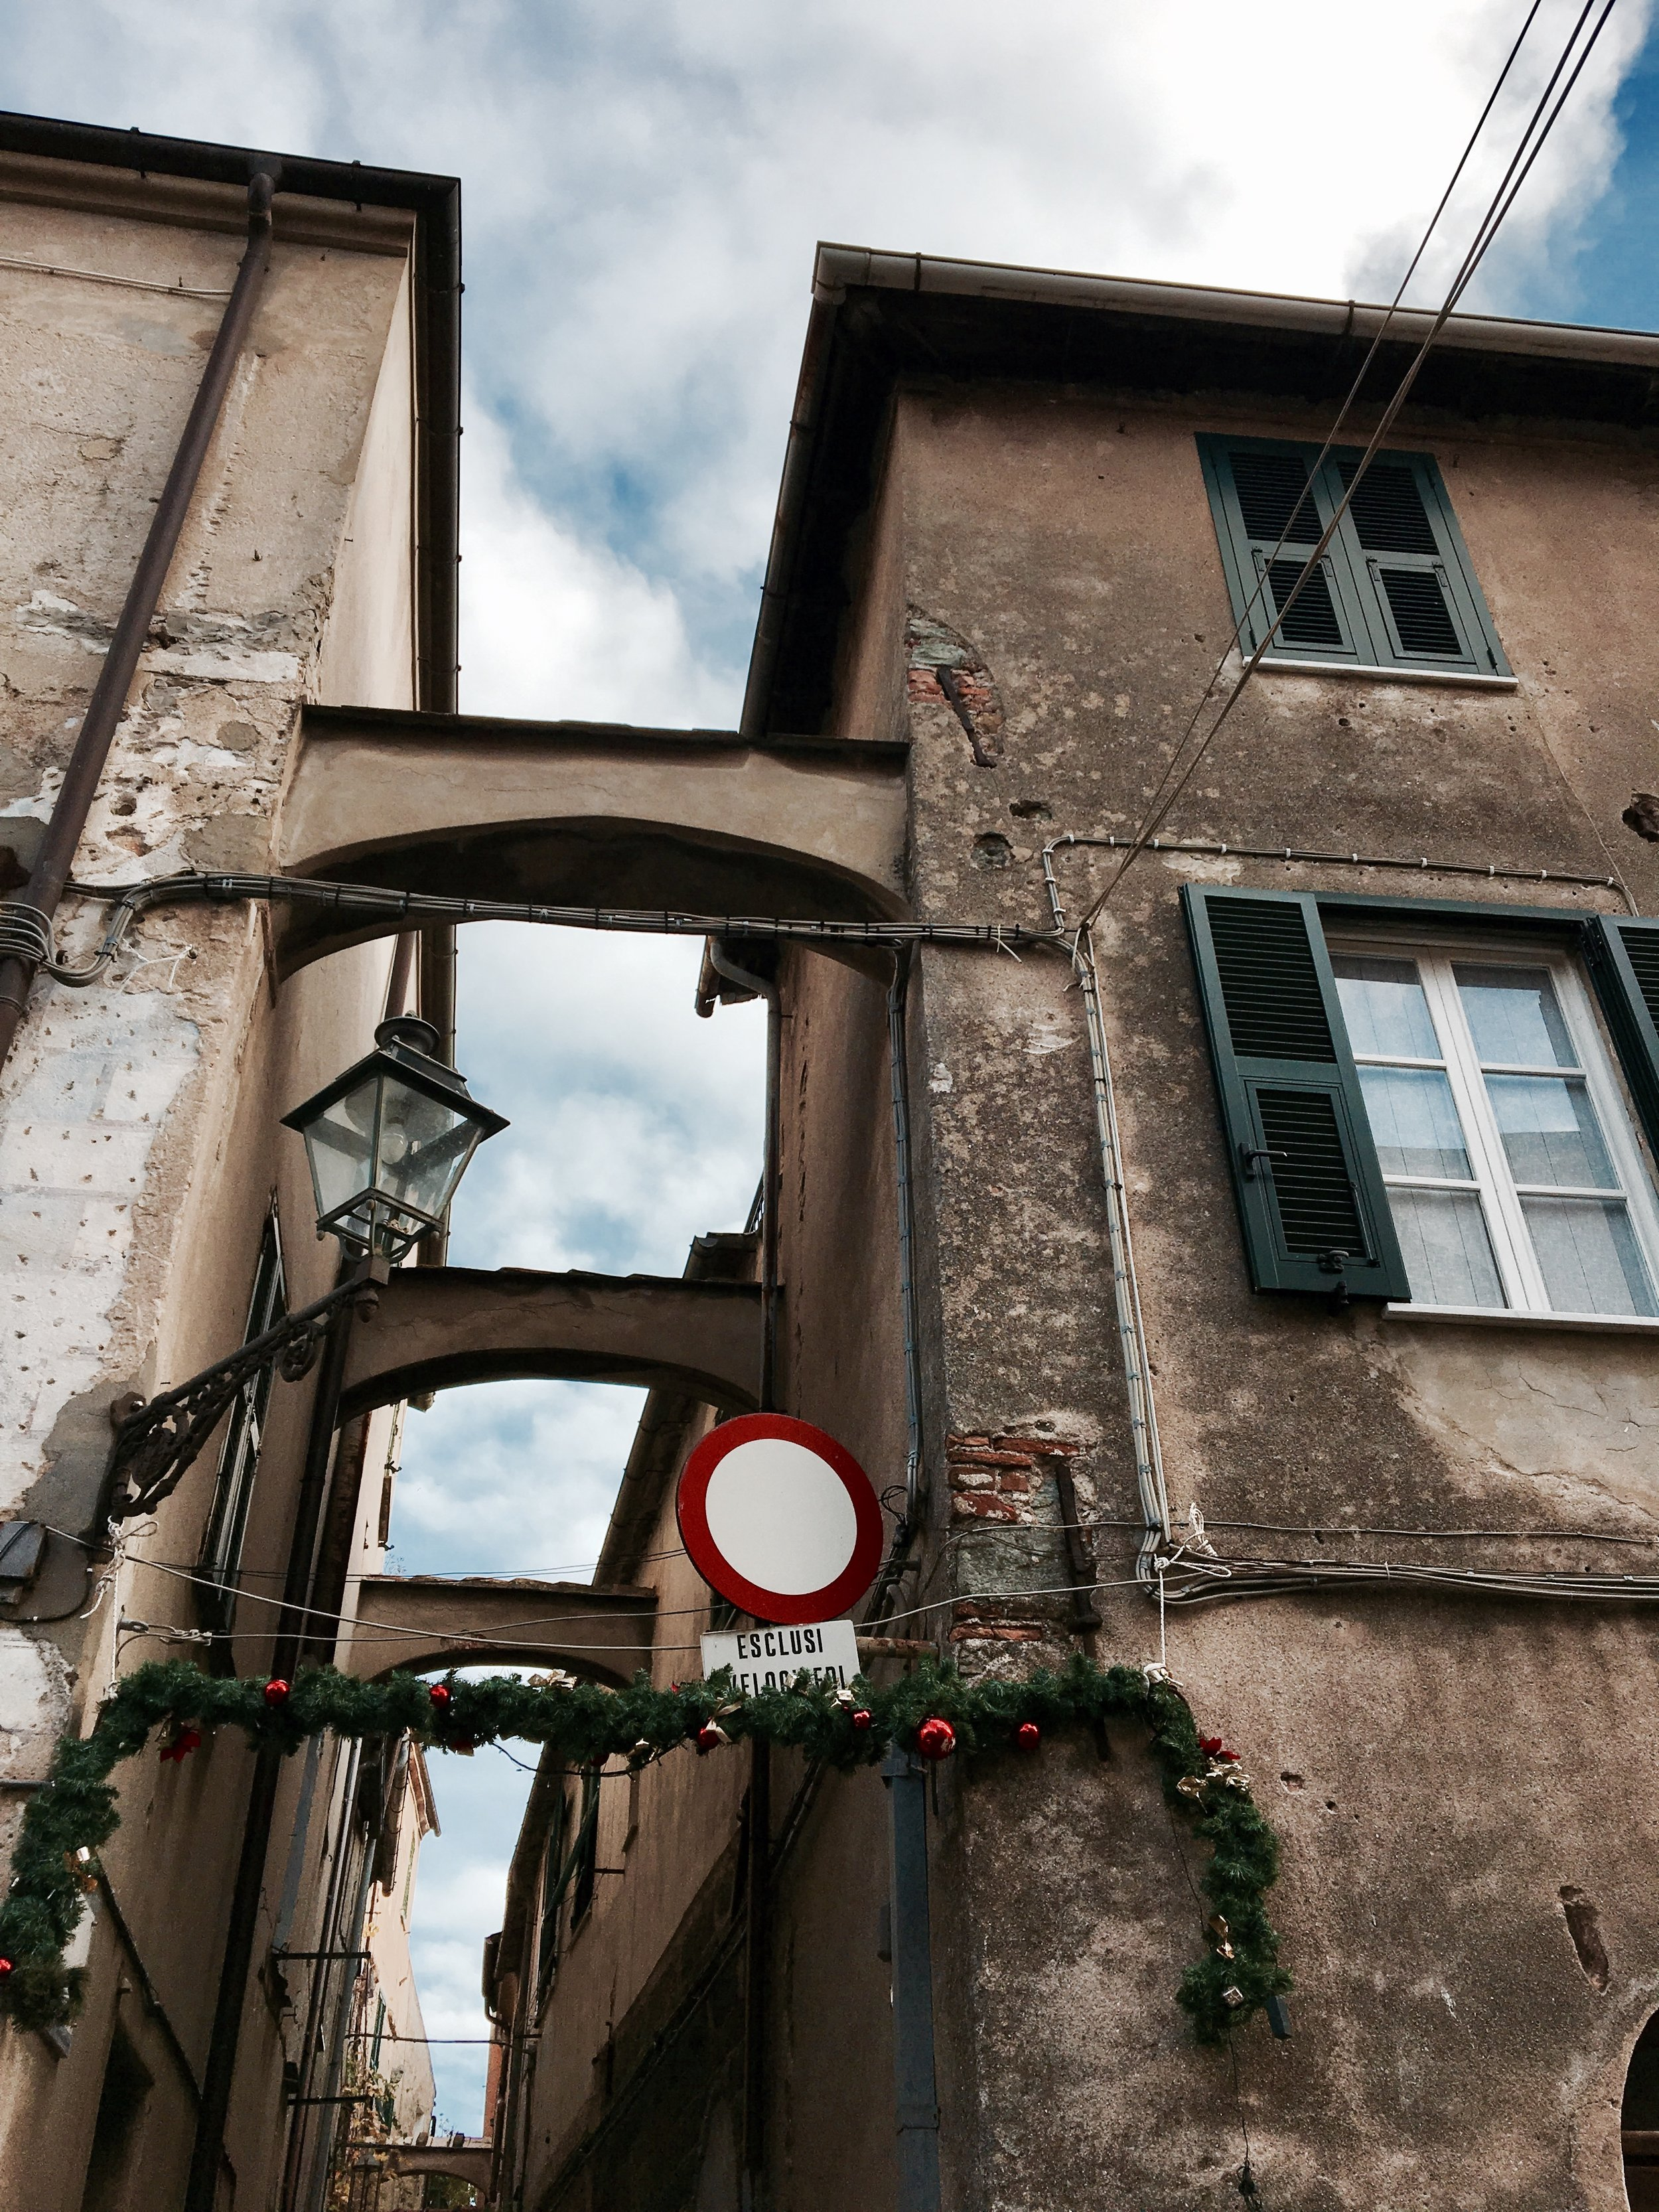 CUNEO - ITALY | 29 December 2016